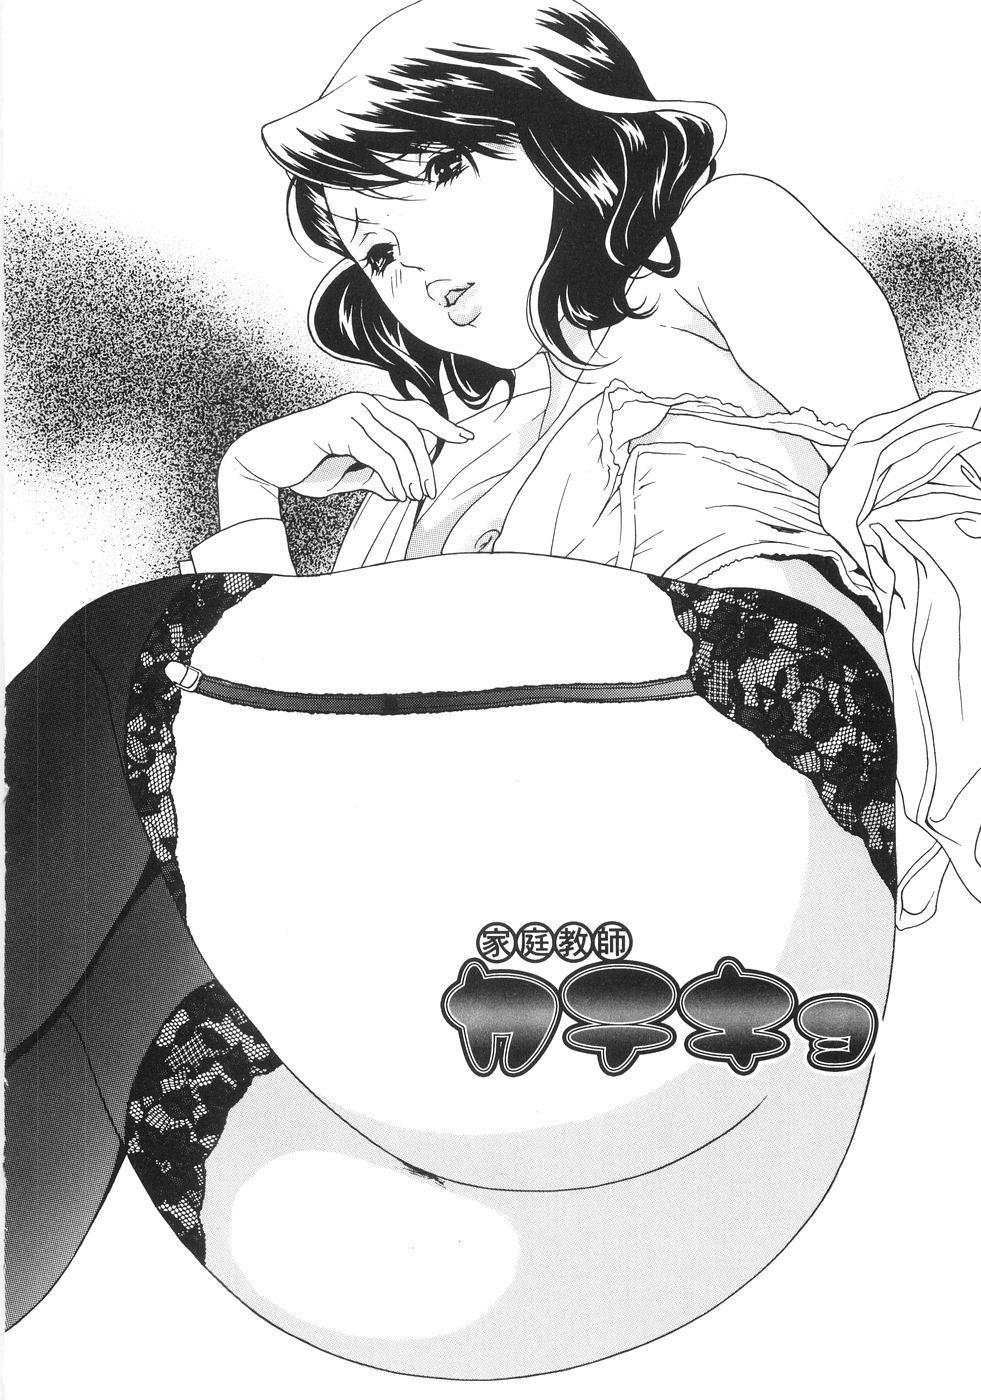 Honki Jiru - Cowper's Gland Liquid? or Love Juice?...?! 16